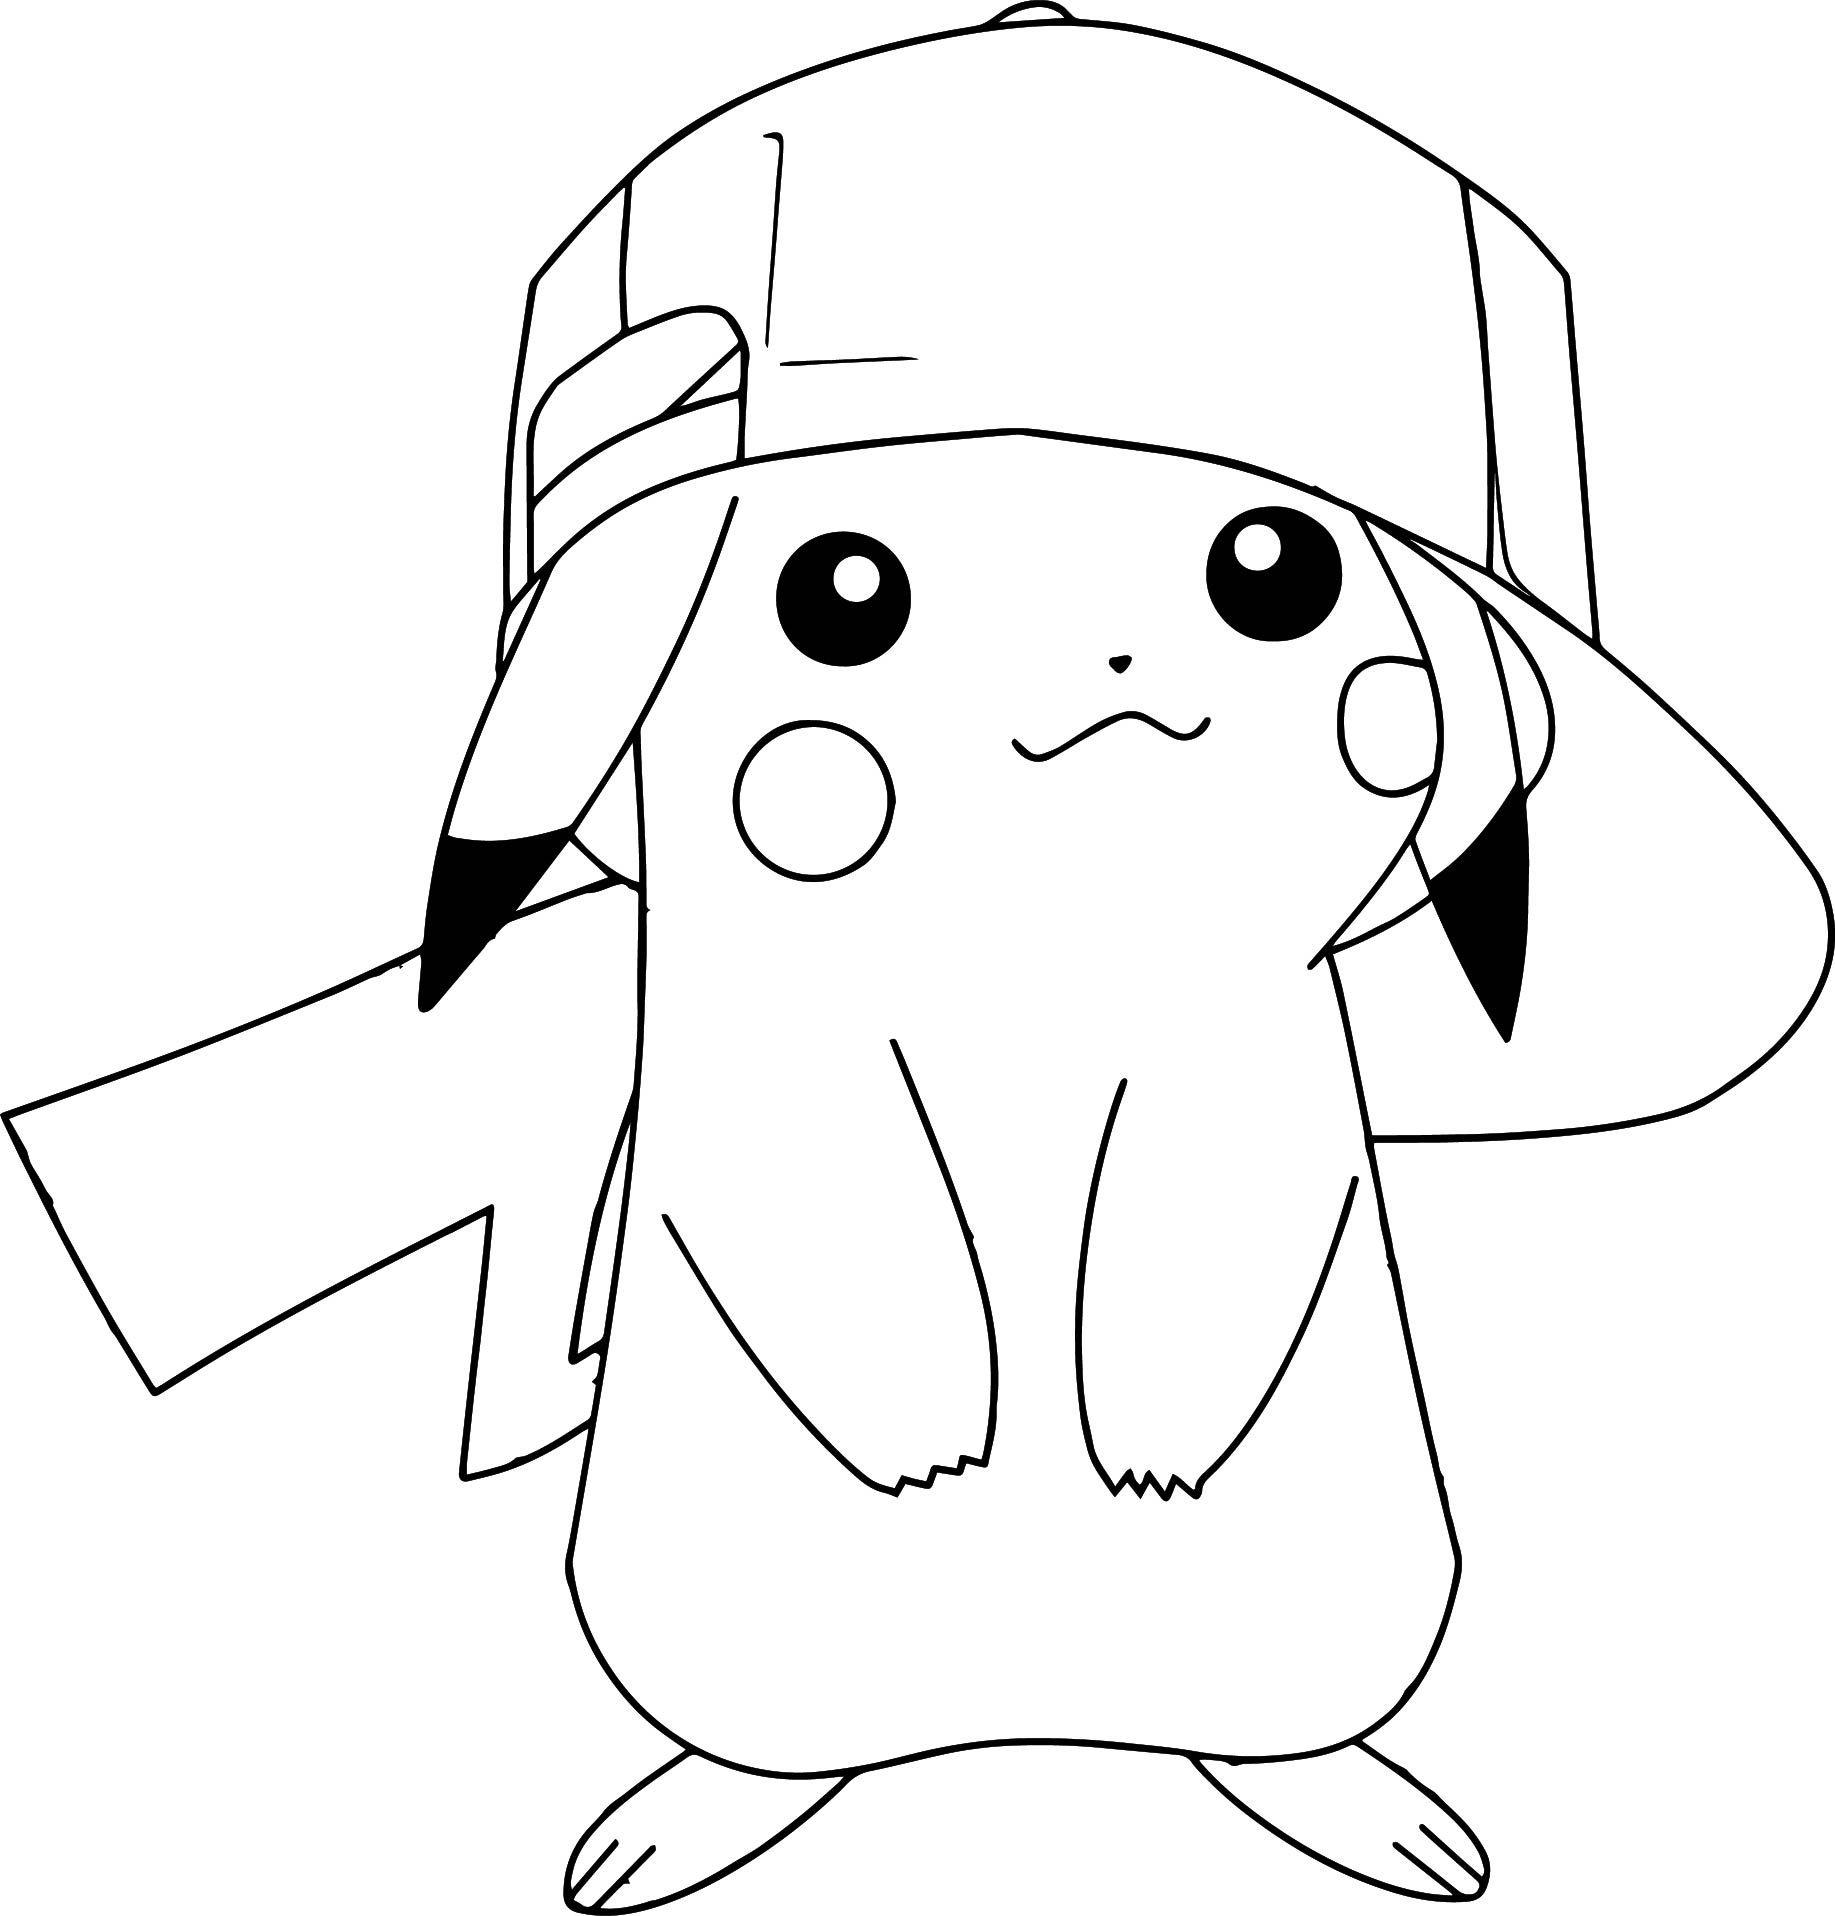 Pokemon Coloring Pages Pikachu Wearing Hat | Pikachu concernant Coloriage Pikachu